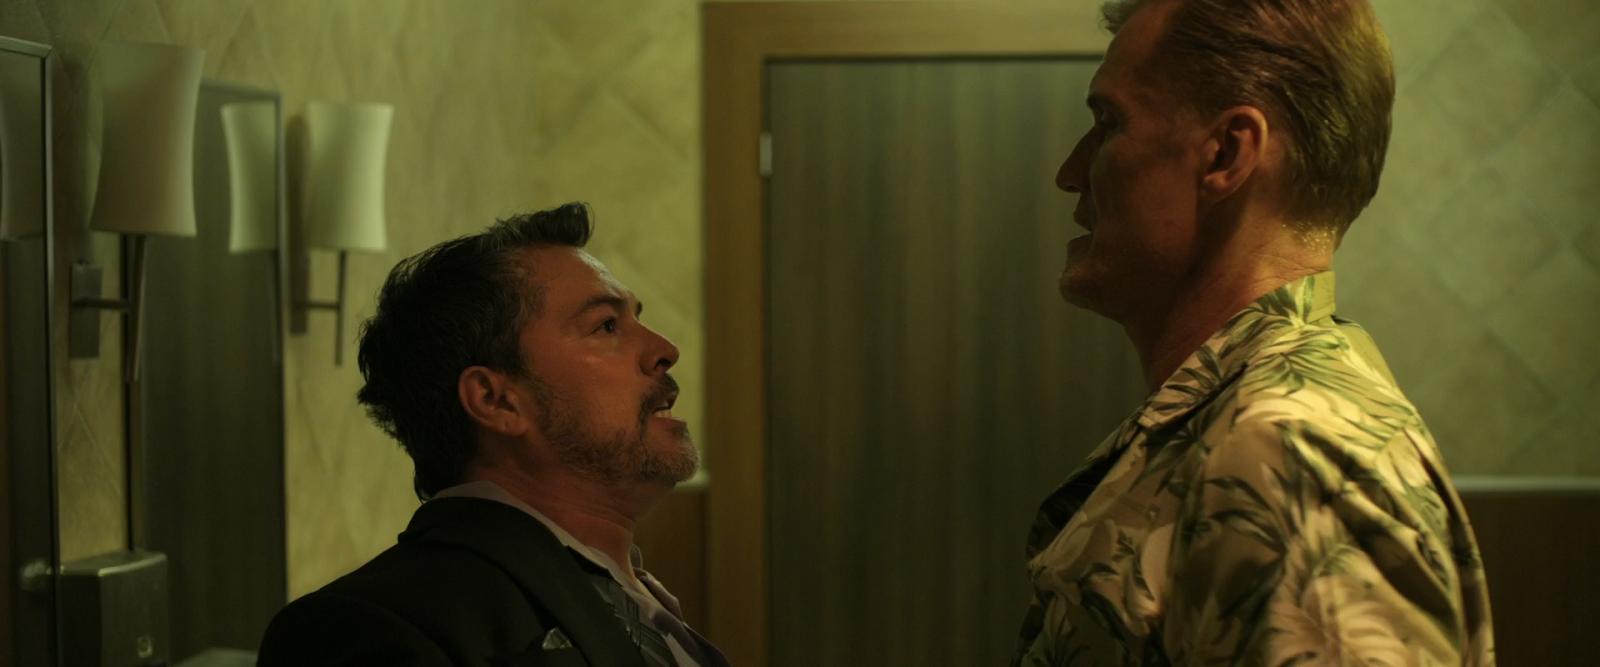 El infiltrado (Larceny) (2016) 1080p Latino - Ingles captura 1